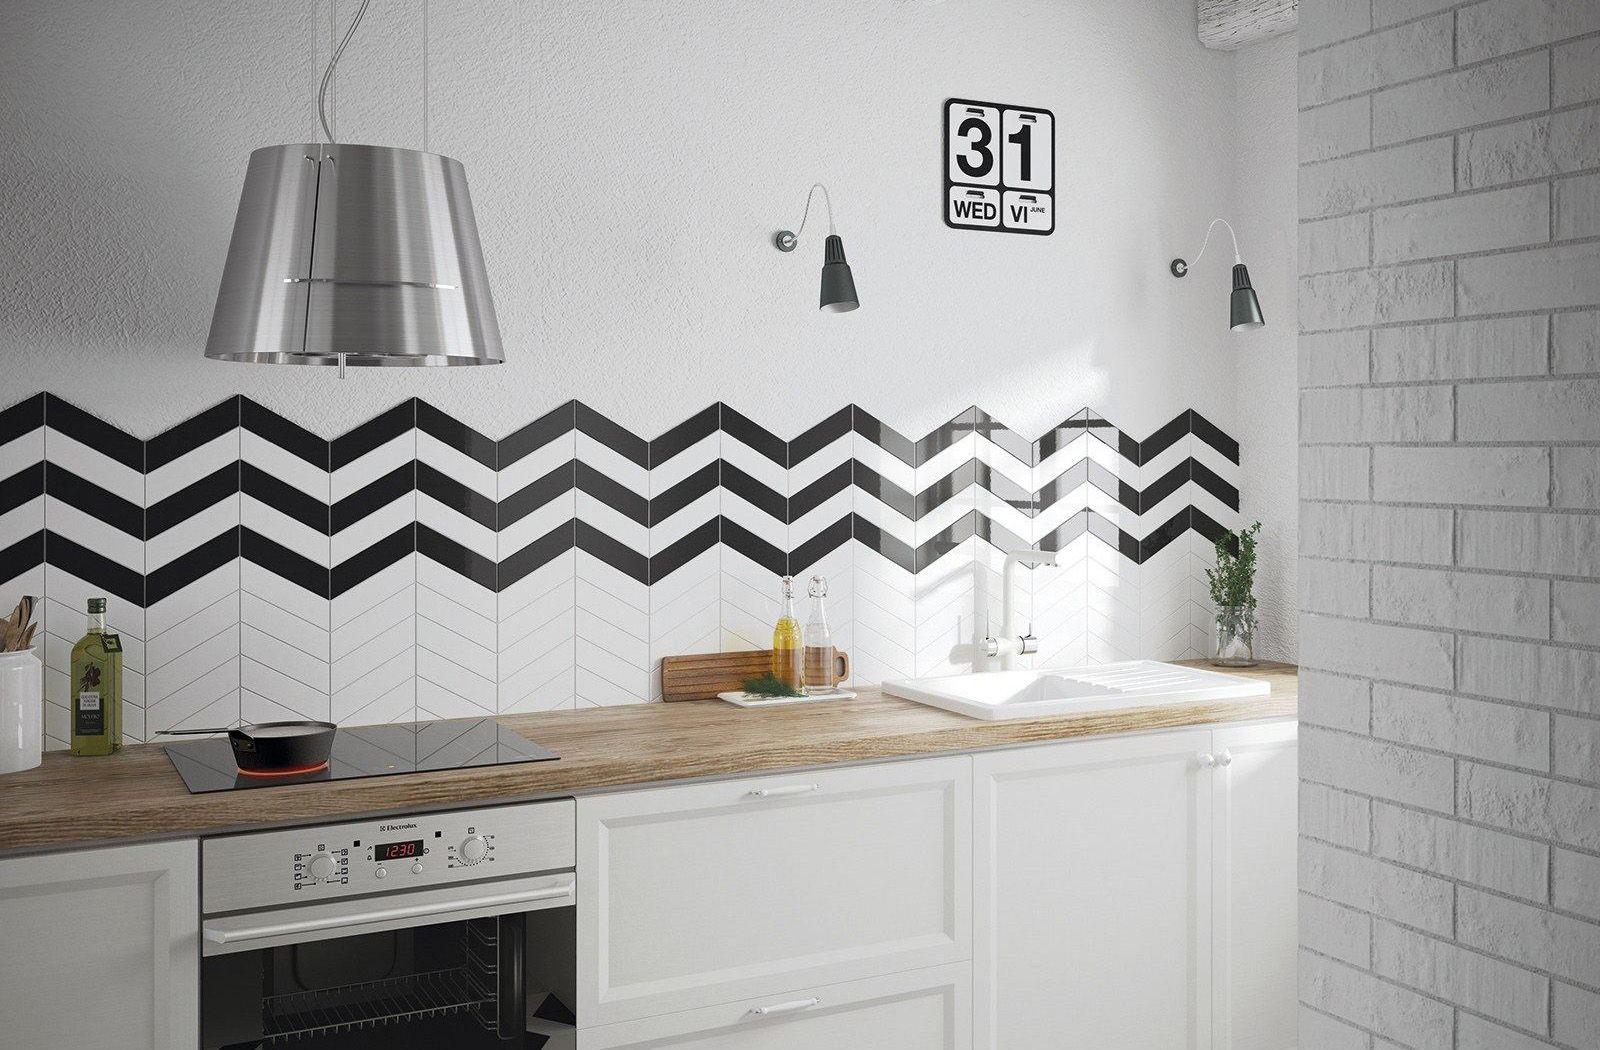 Funky black and white kitchen backsplash with Chevronwall tile ...